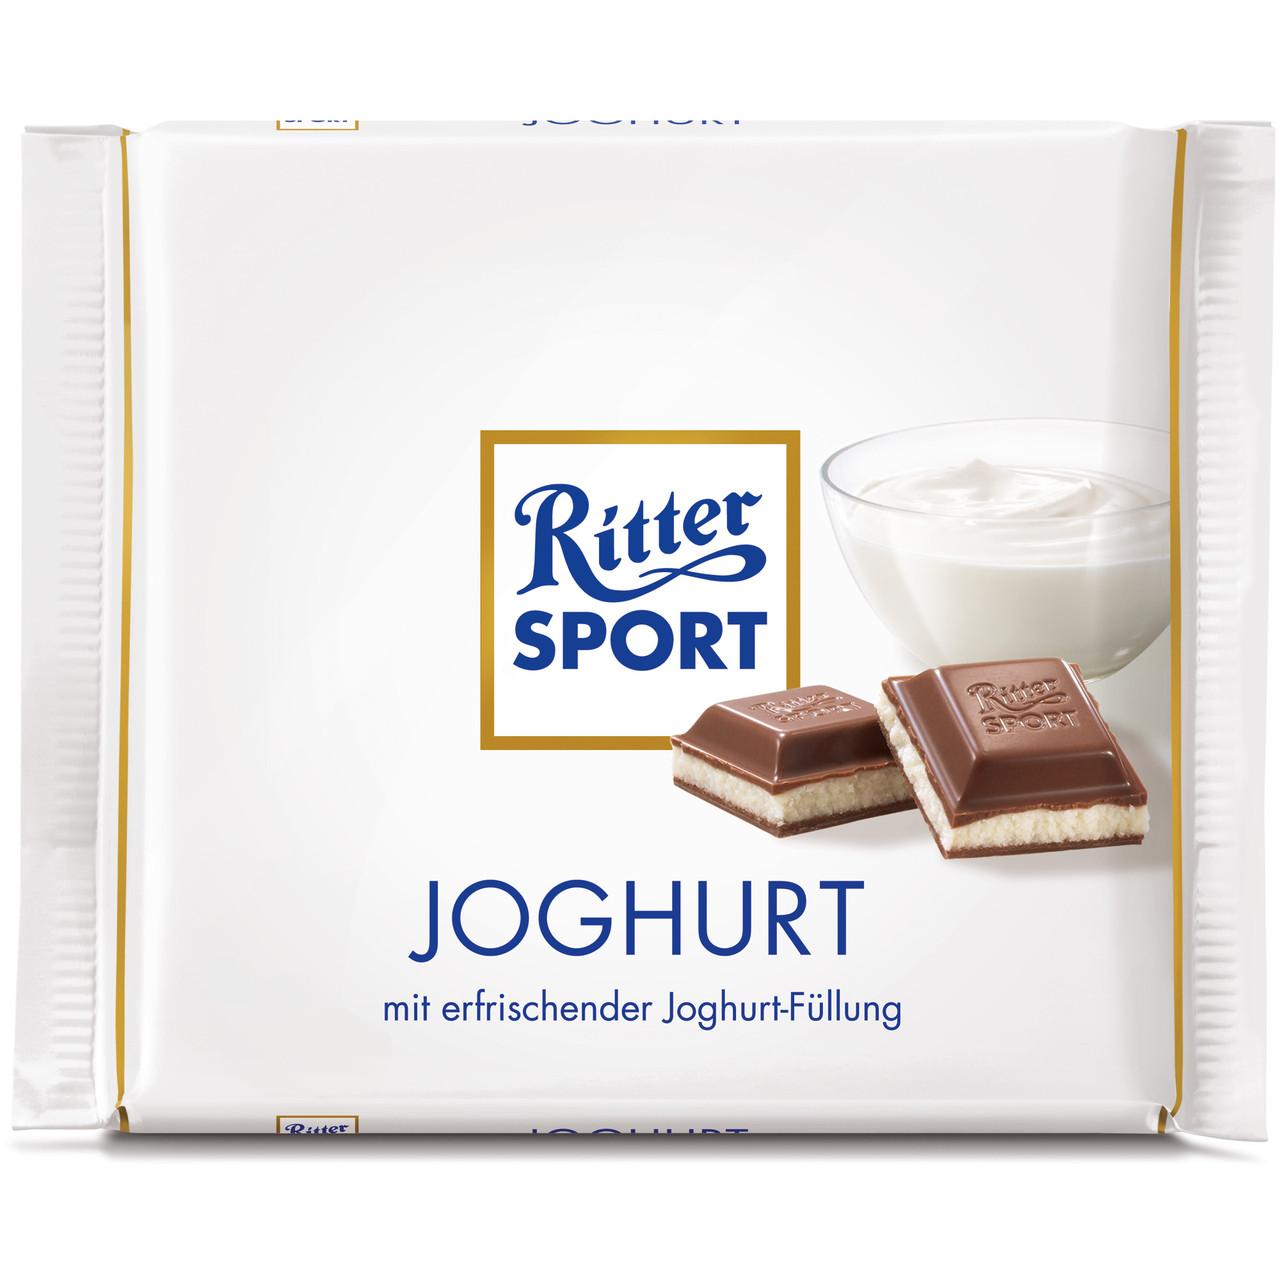 Шоколад Ritter Sport Joghurt (Риттер Спорт с йогуртом), 100 г